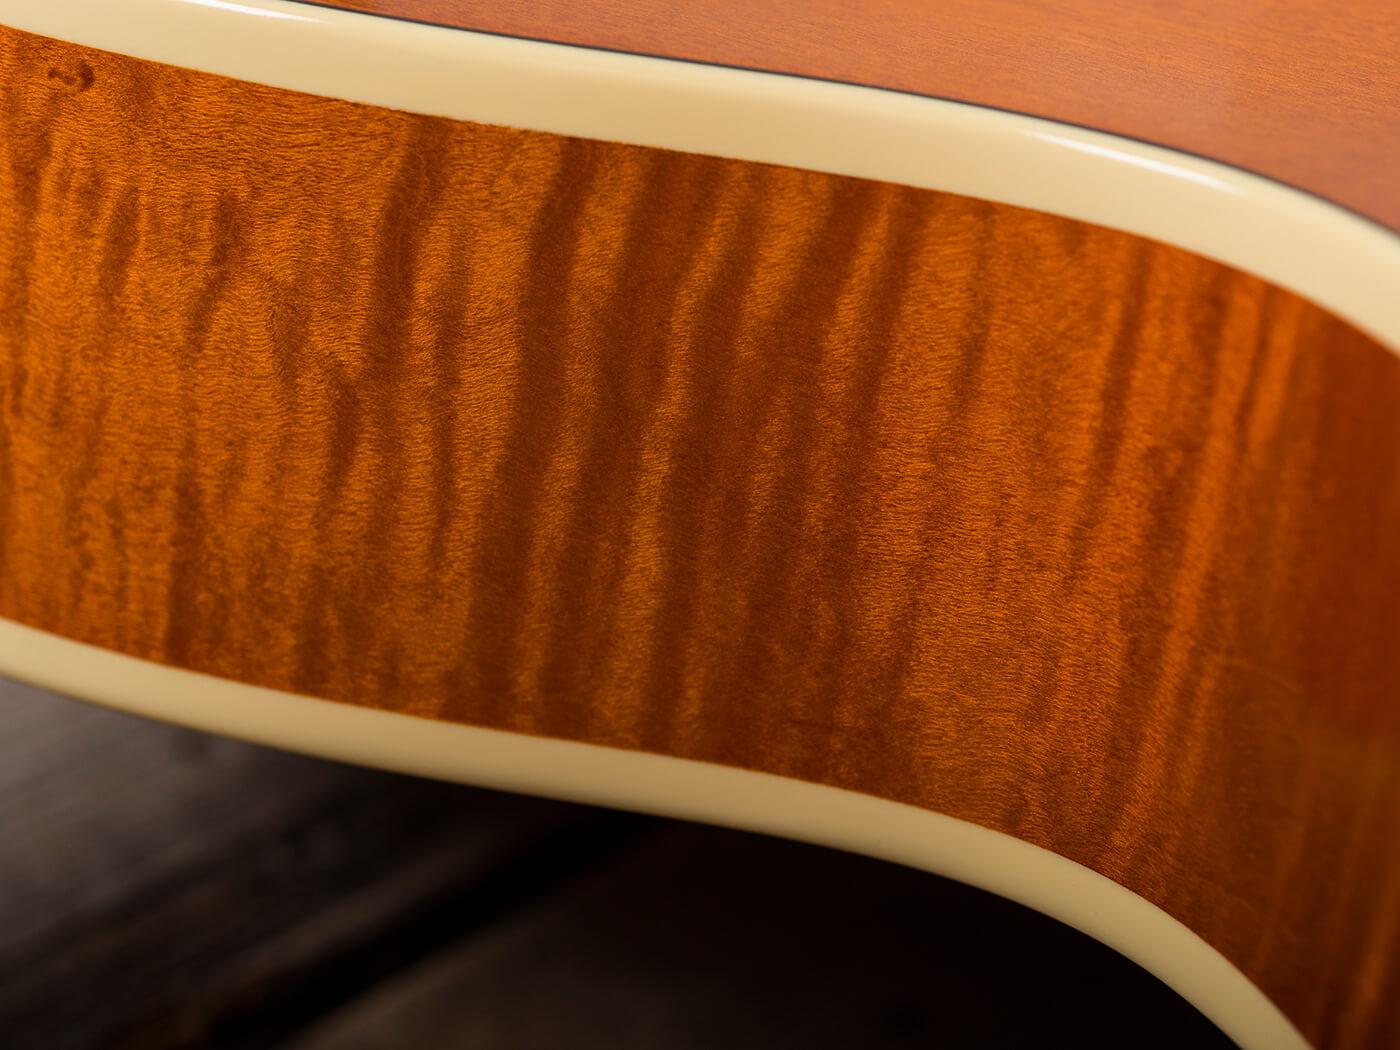 Brian Setzer Signature Nashville '59 'Smoke'